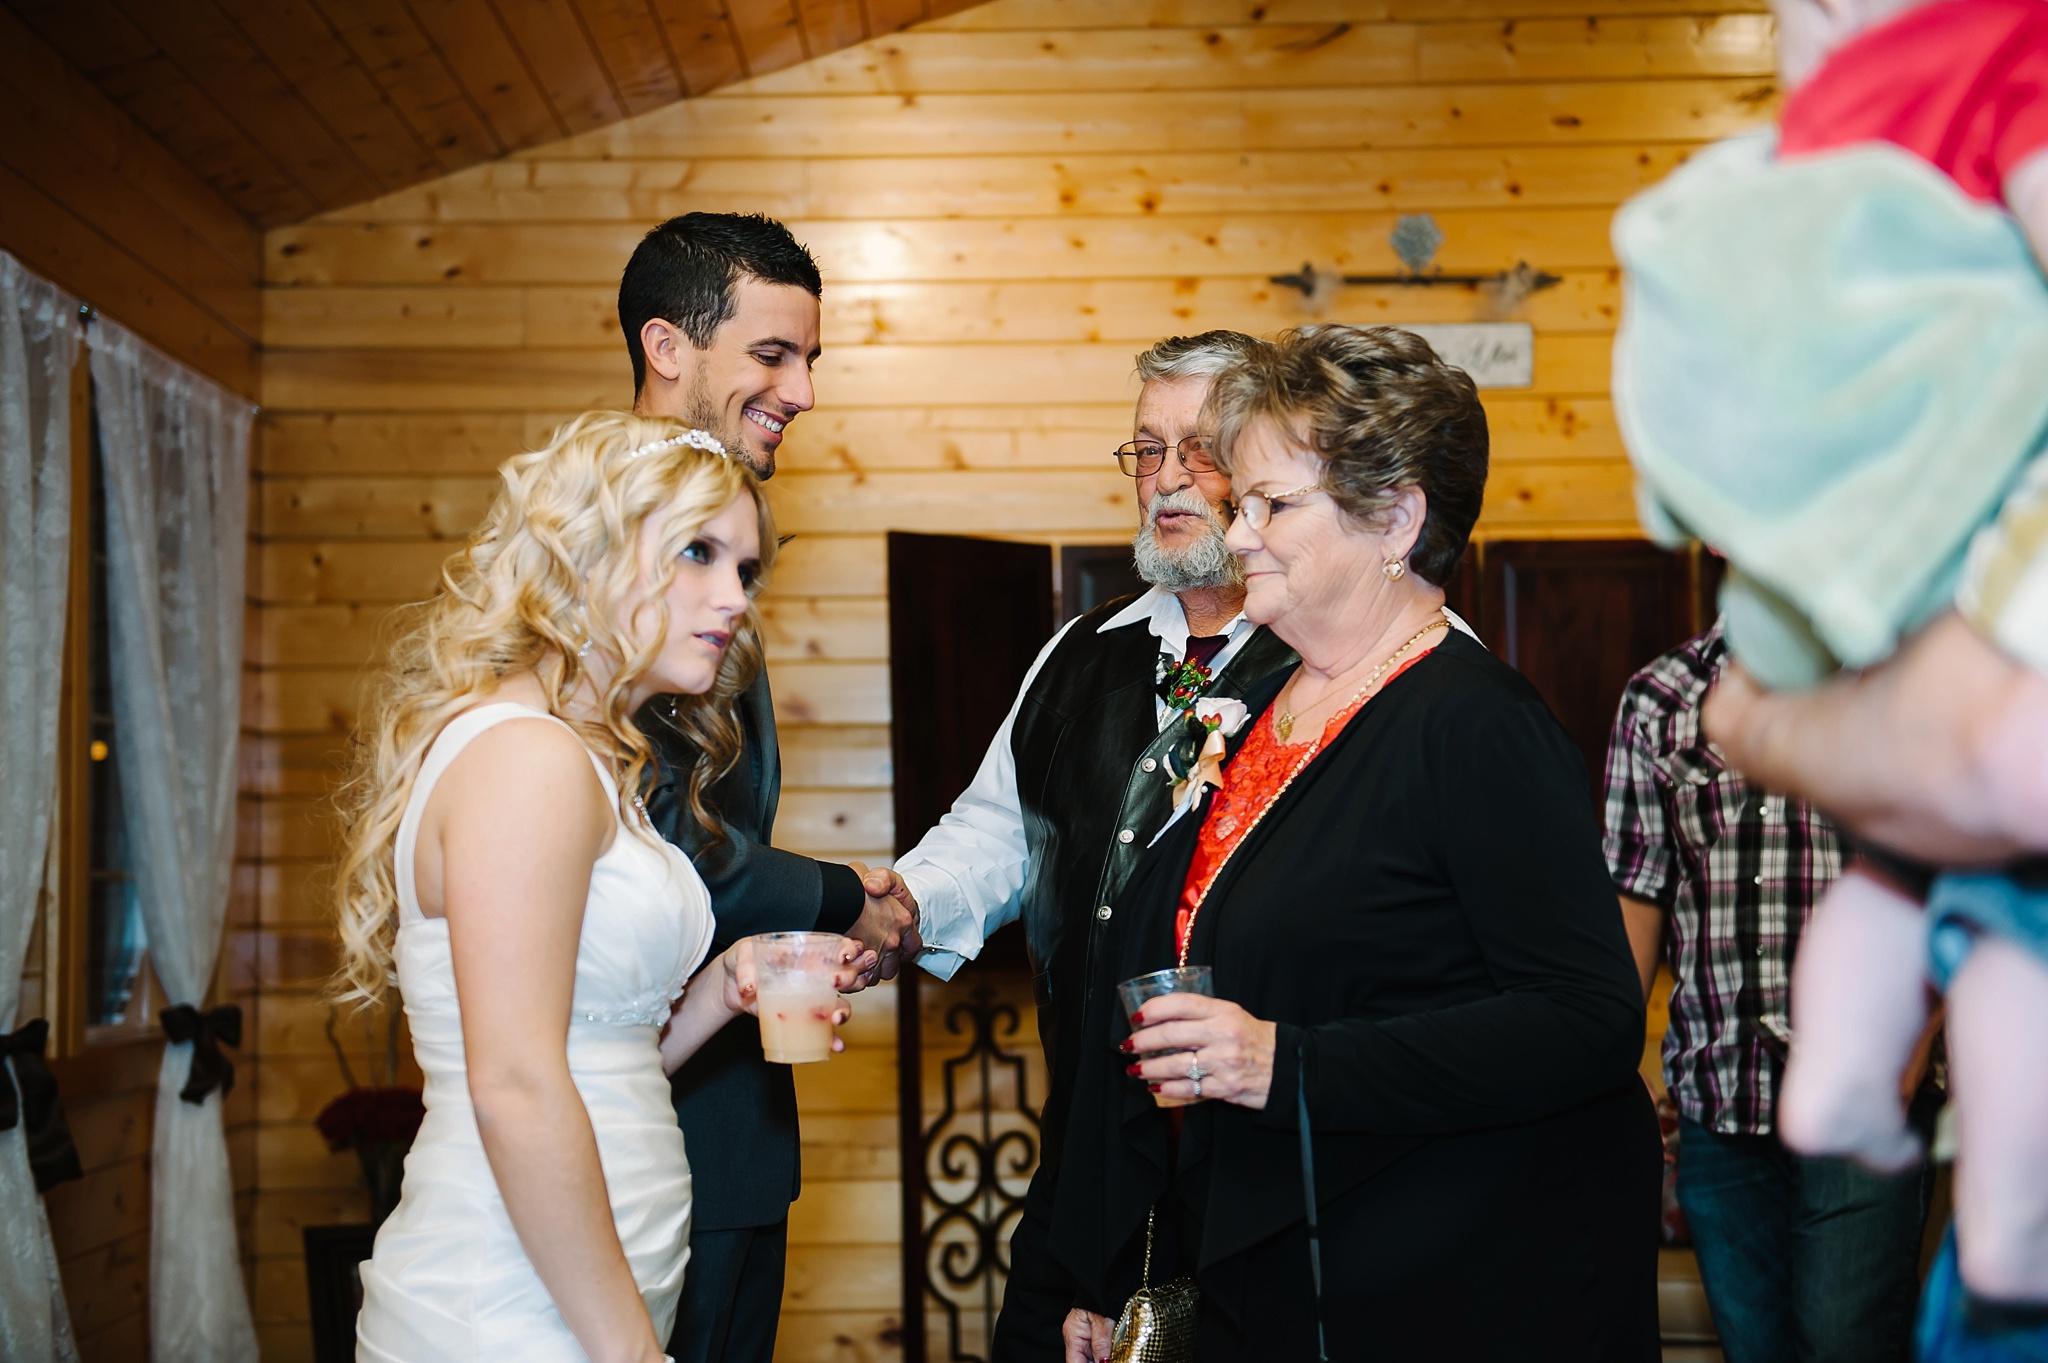 SLC Utah Wedding Photographer Ali Sumsion 115